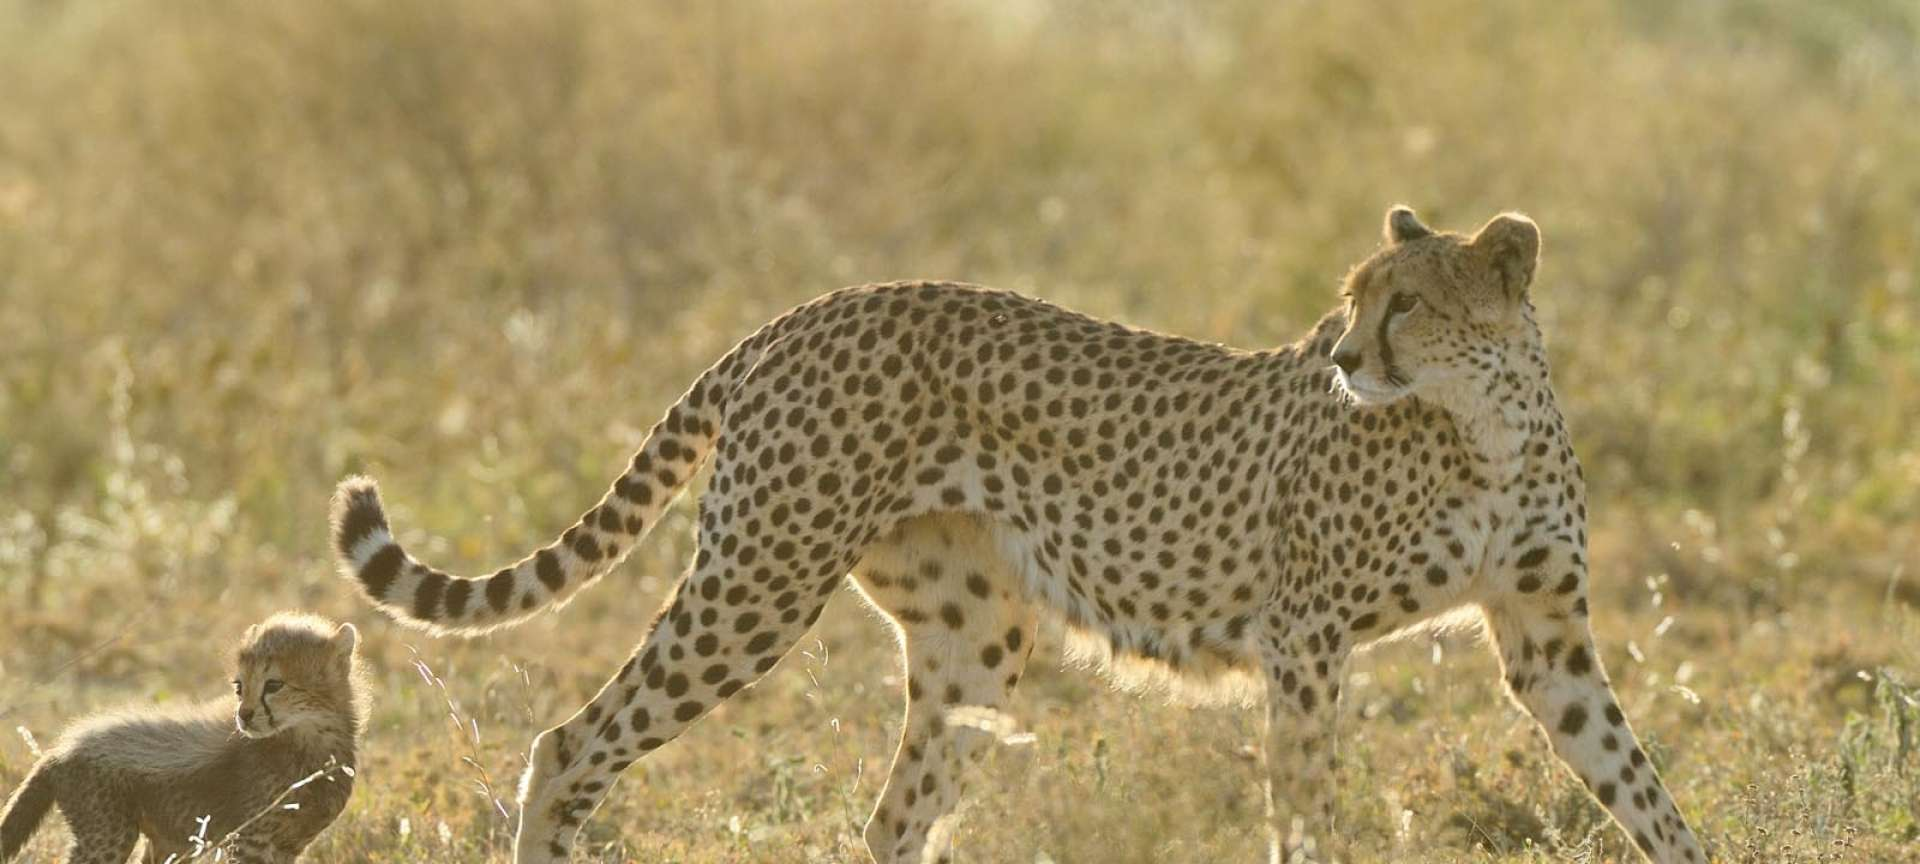 serengeti-wildlife-photography